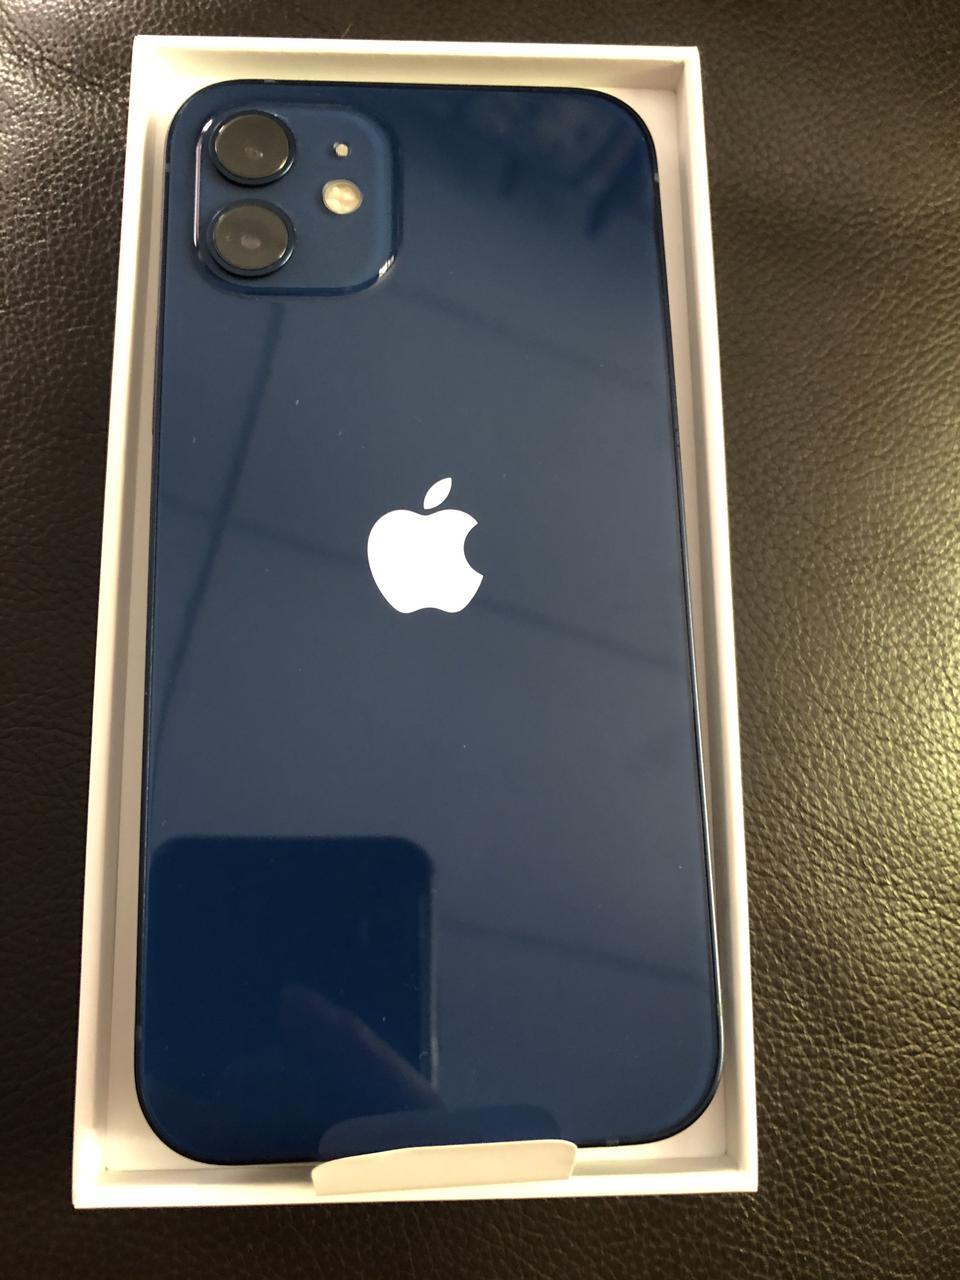 Iphone 12 256 gb สีน้ำเงิน แท้ ของใหม่  รูปที่ 4